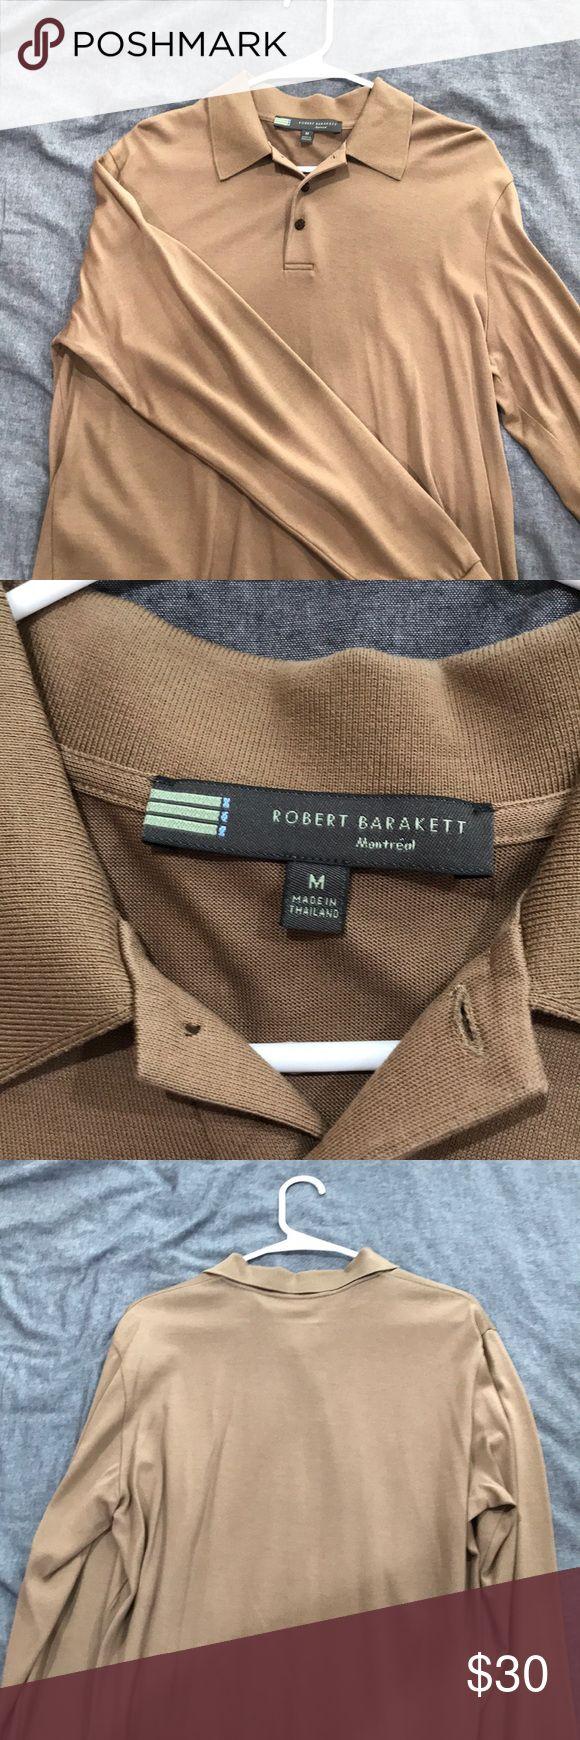 Robert Barakett long sleeve polo shirt Long sleeve polo Extremely soft, silk like material Size medium Tan color Robert Barakett Shirts Polos